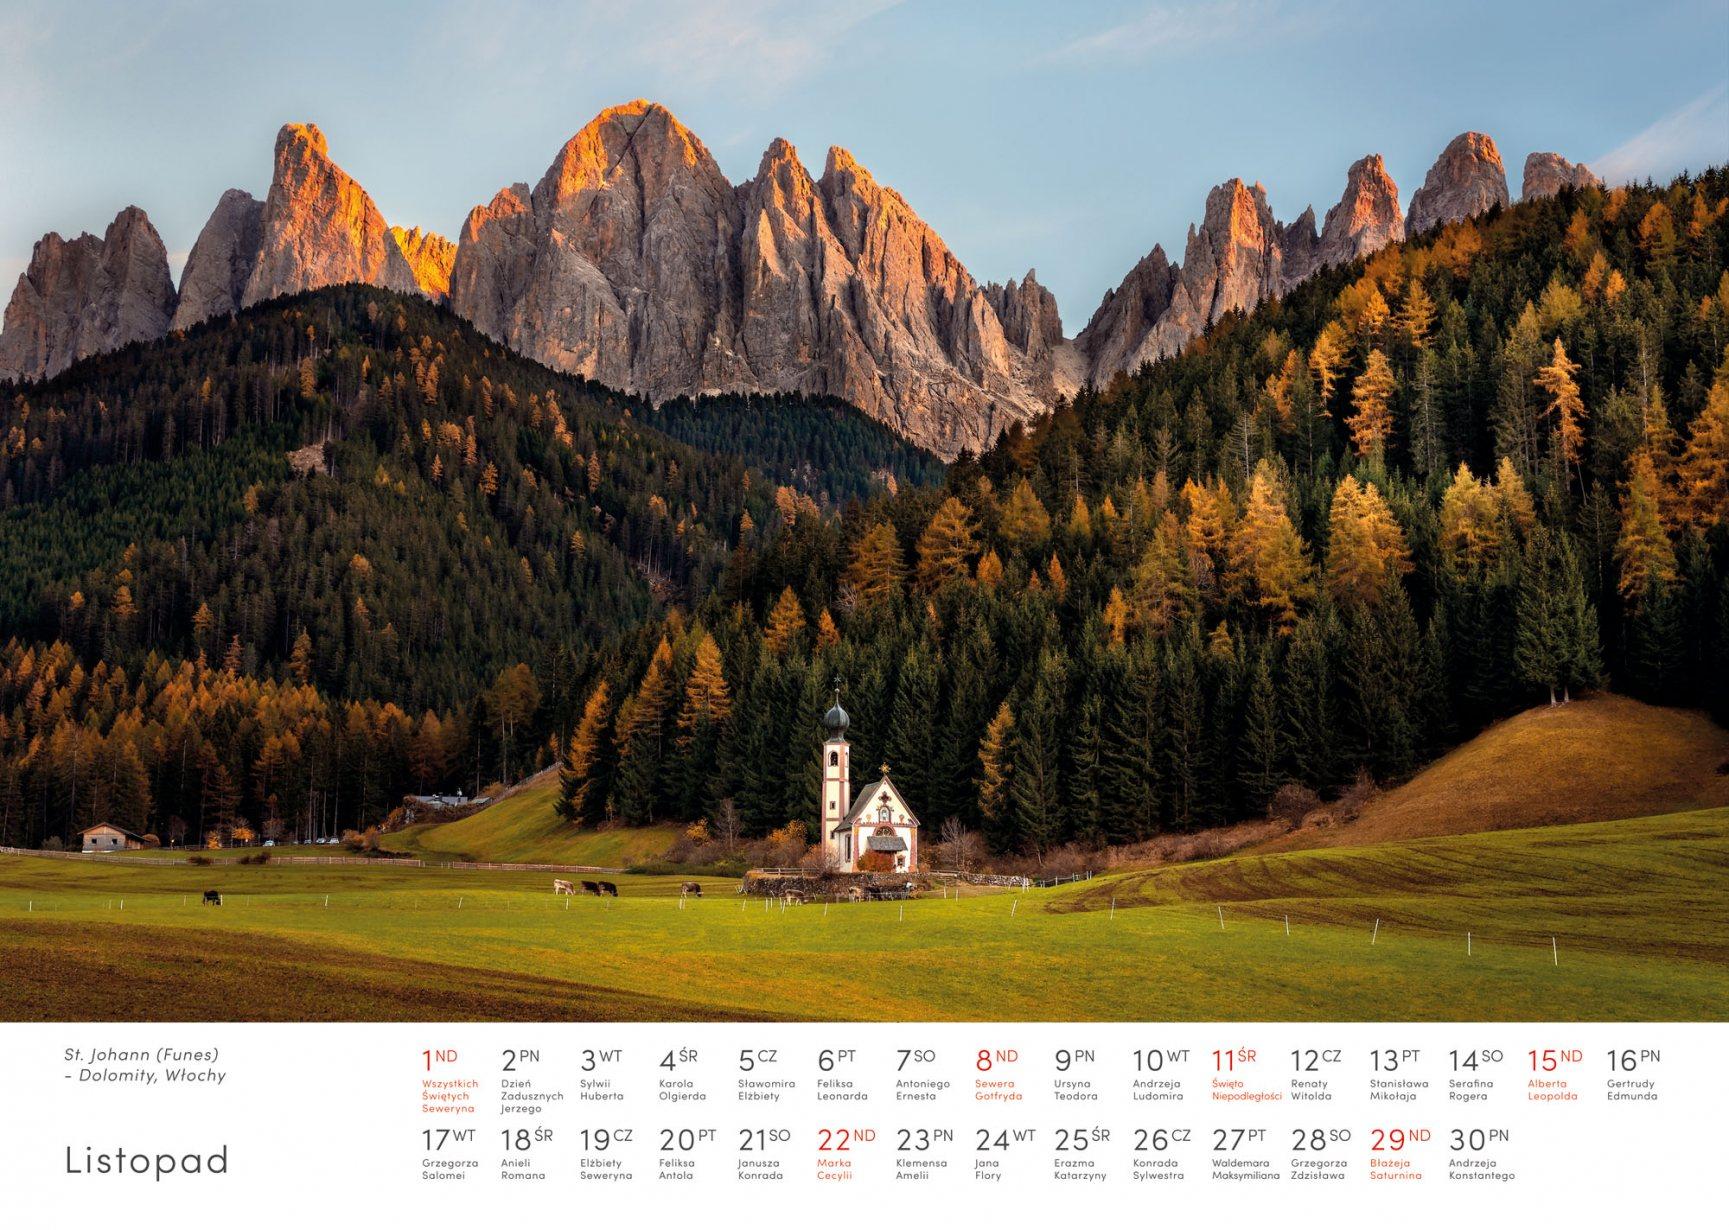 Kalendarz krajobrazy 2020 - Listopad - Piotr Kałuża - La Valle St. Maddalena Dolomity